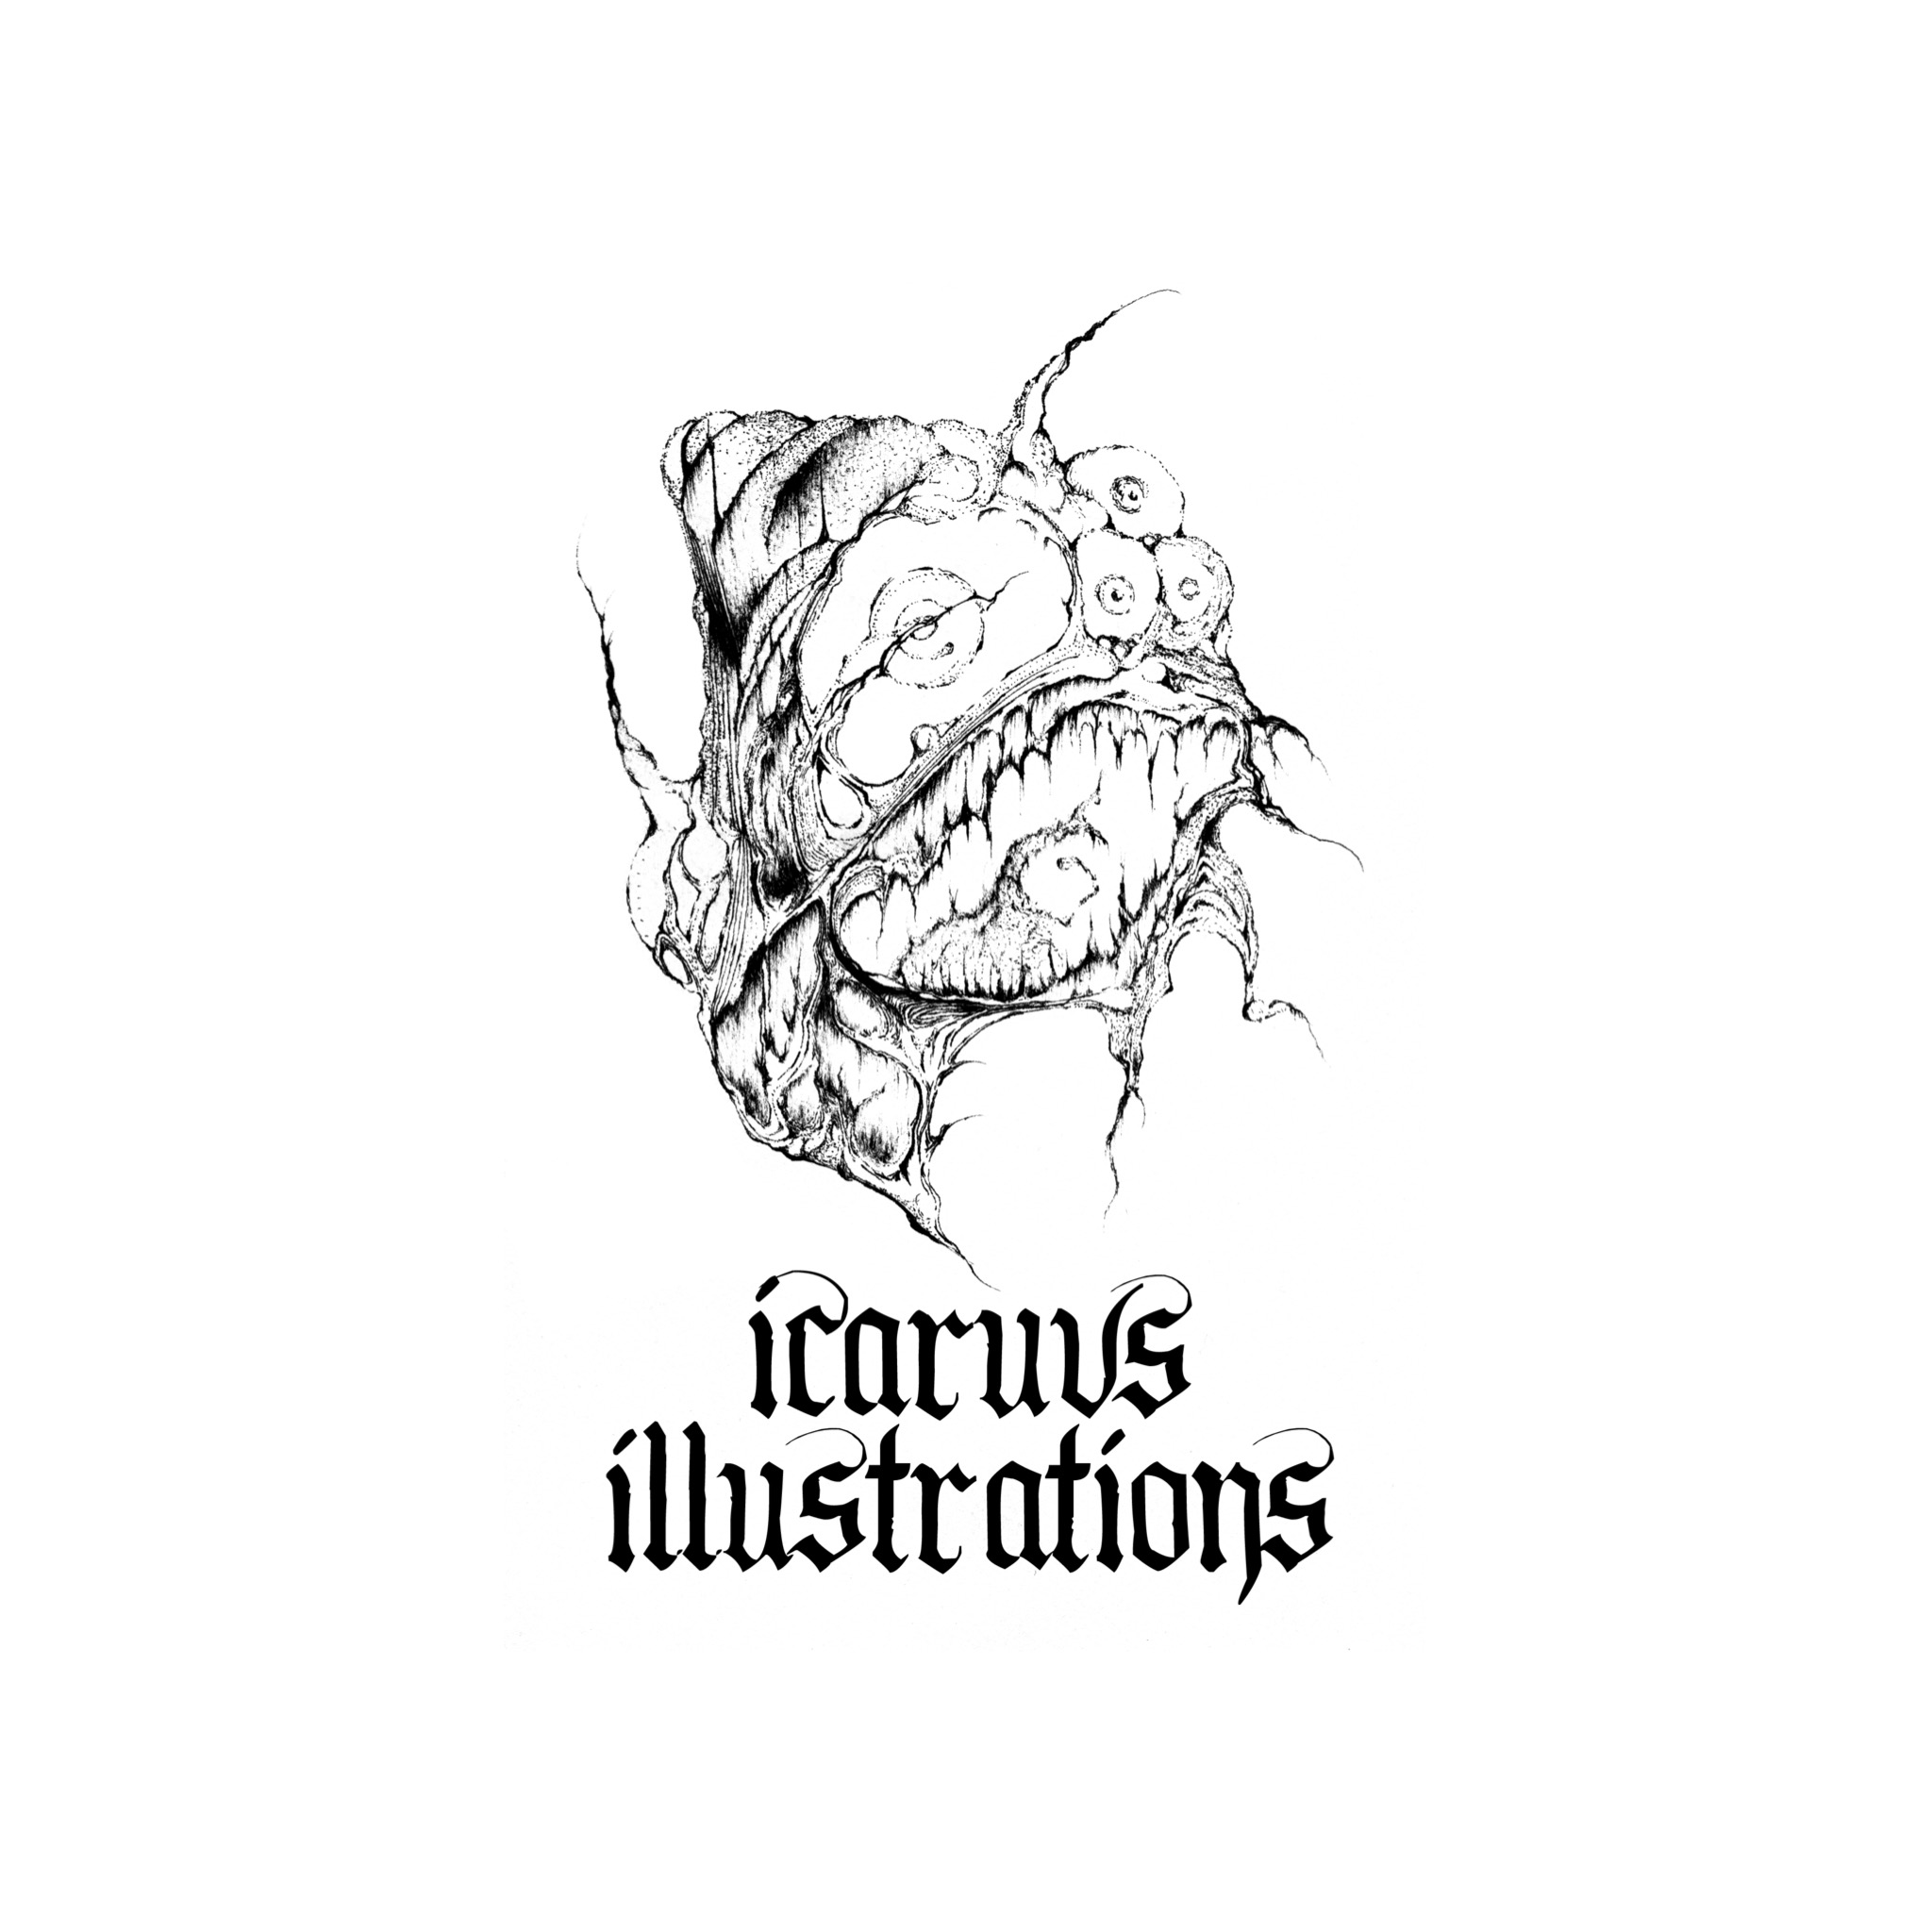 Icaruvs Illustrations